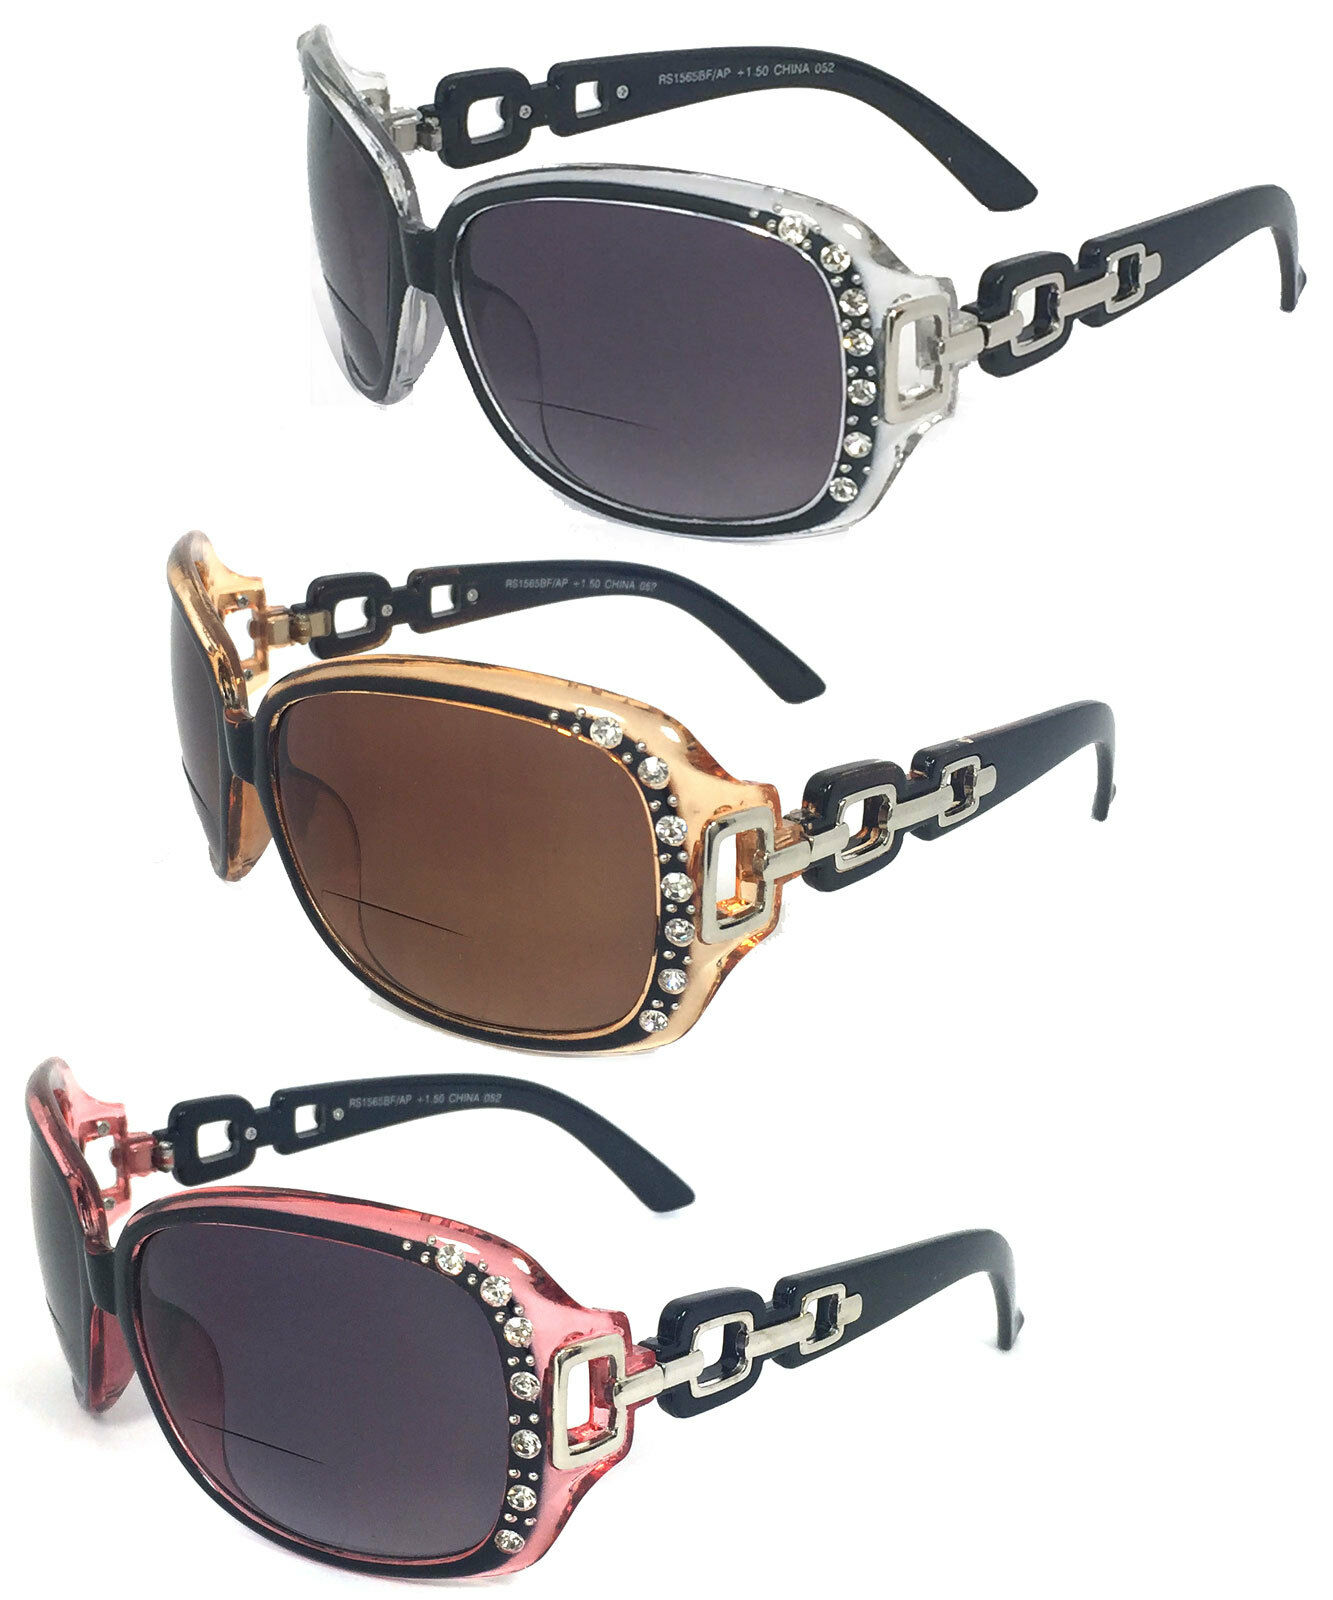 070ca9345c89 Bifocal Sunglasses On Ebay